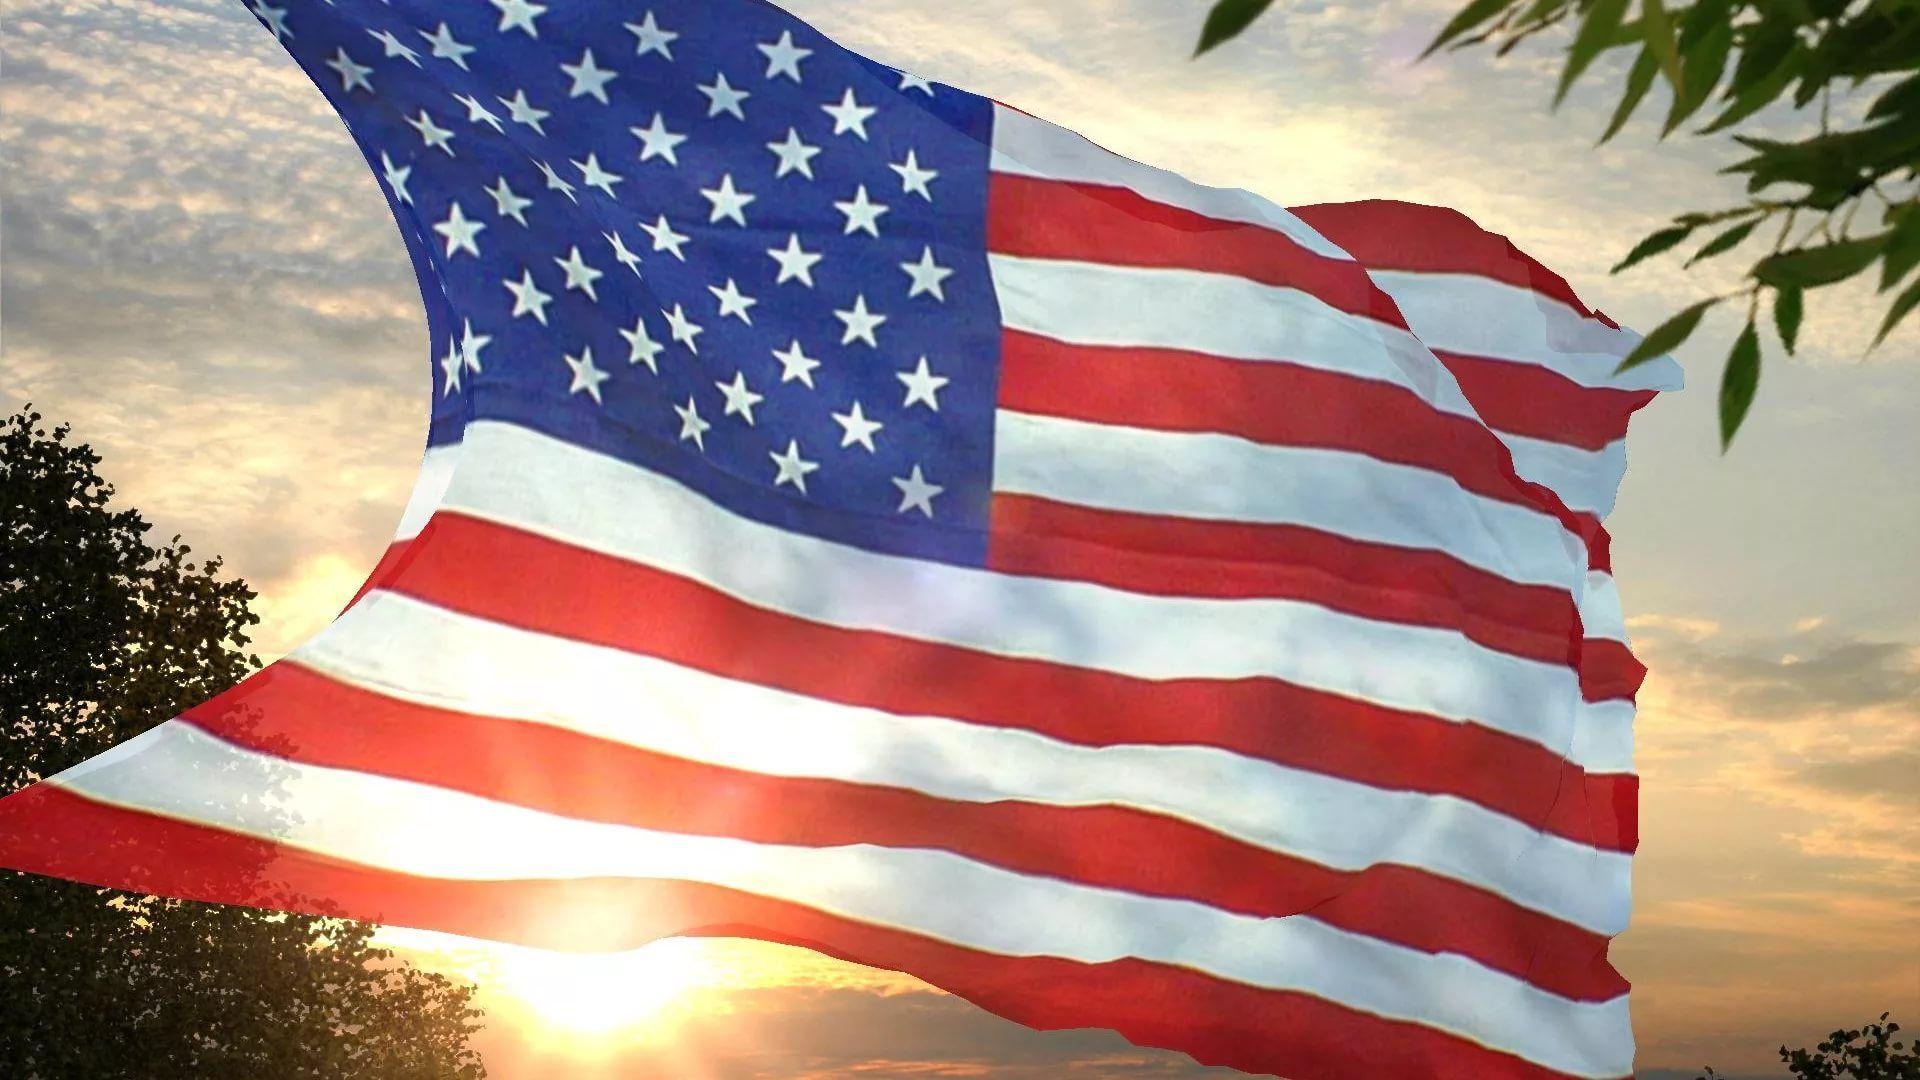 America Flag wallpaper image hd